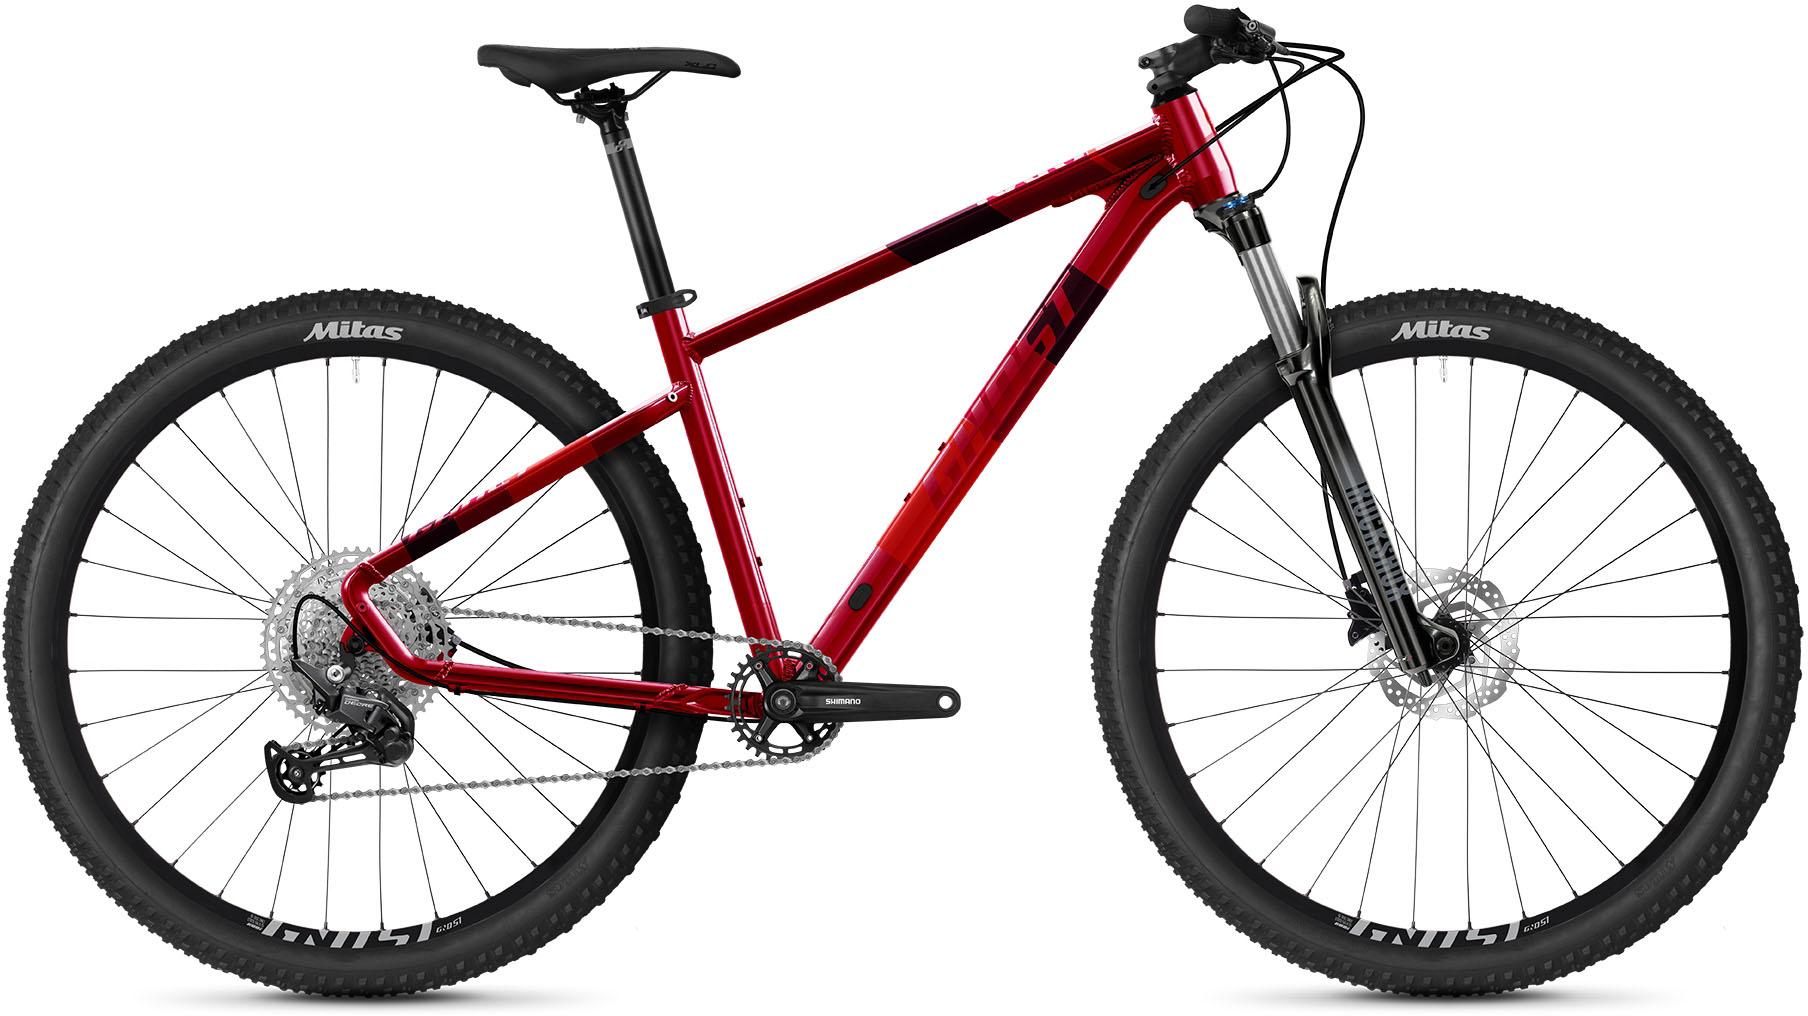 Ghost Mountainbike Kato Pro 29 AL U, 12 Gang, Shimano, RD-M6100 Schaltwerk rot Alle Fahrräder Zubehör Fahrrad